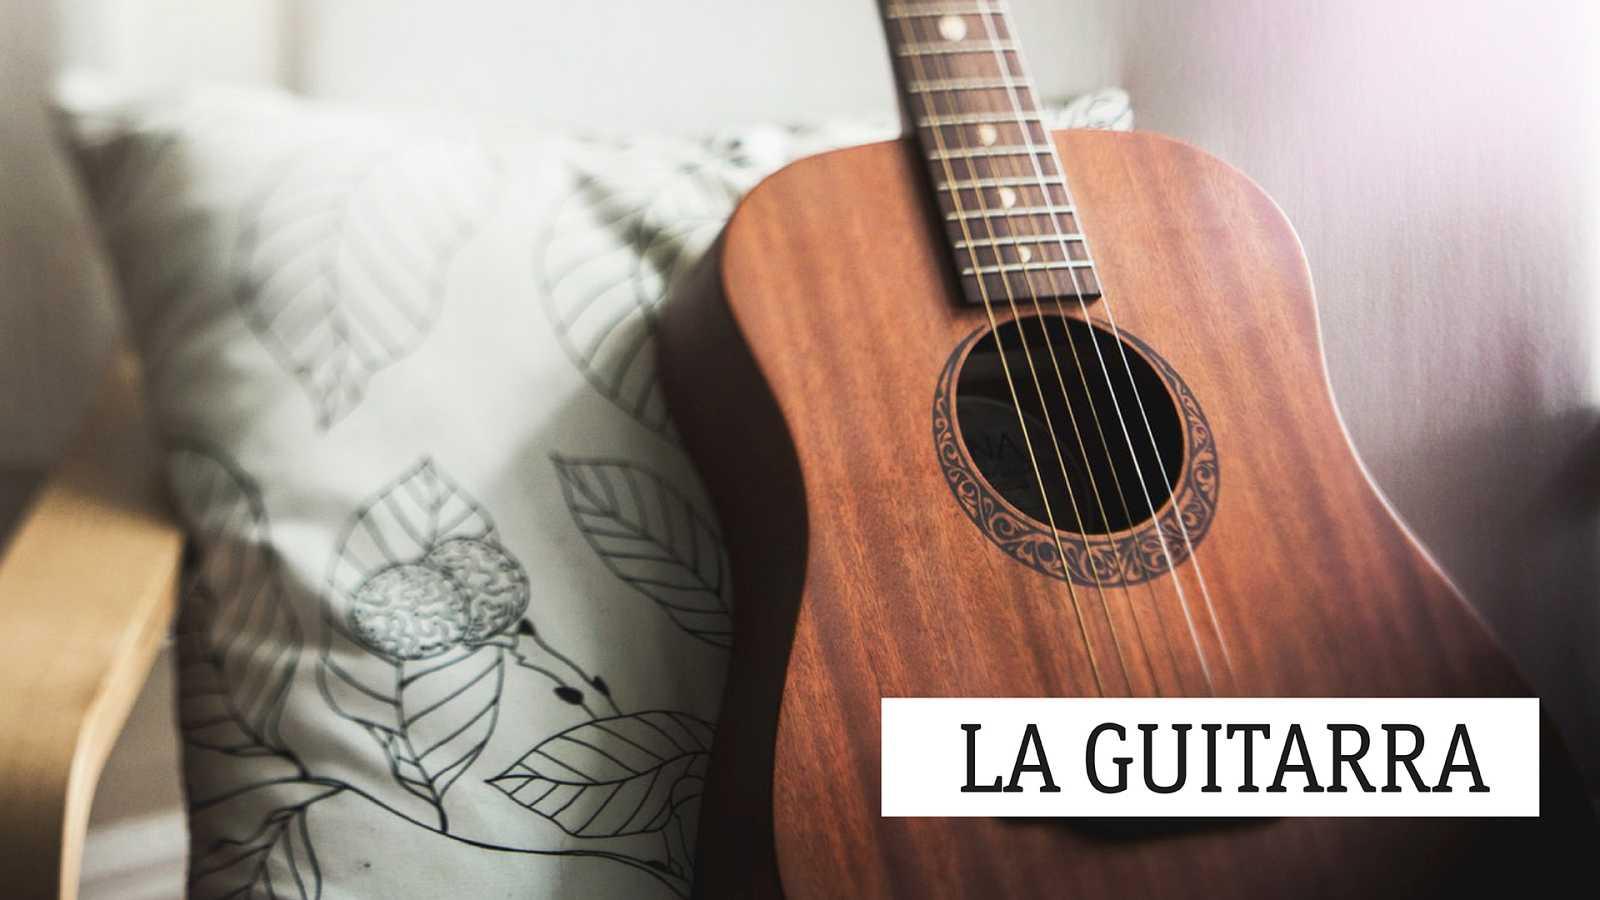 La guitarra - Flávio Apro - 25/10/20 - escuchar ahora